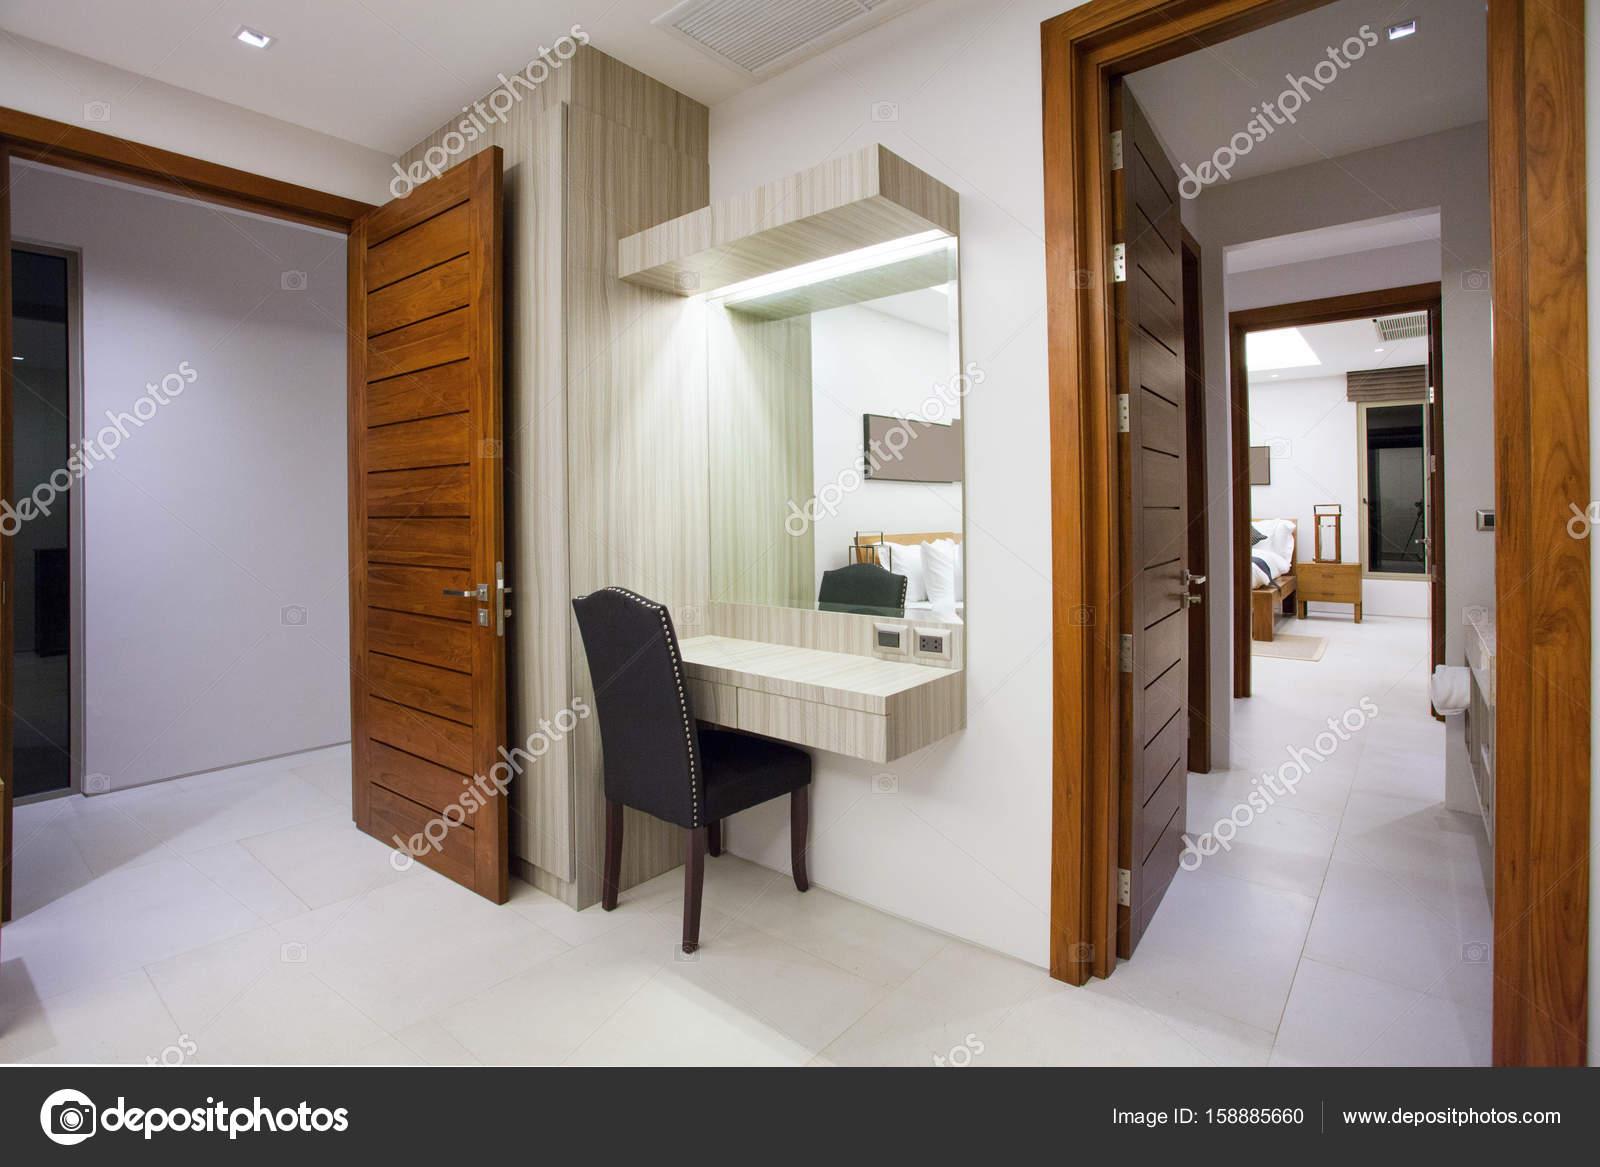 Flur Haus Interieur und Exterieur — Stockfoto © poyoky@gmail.com ...